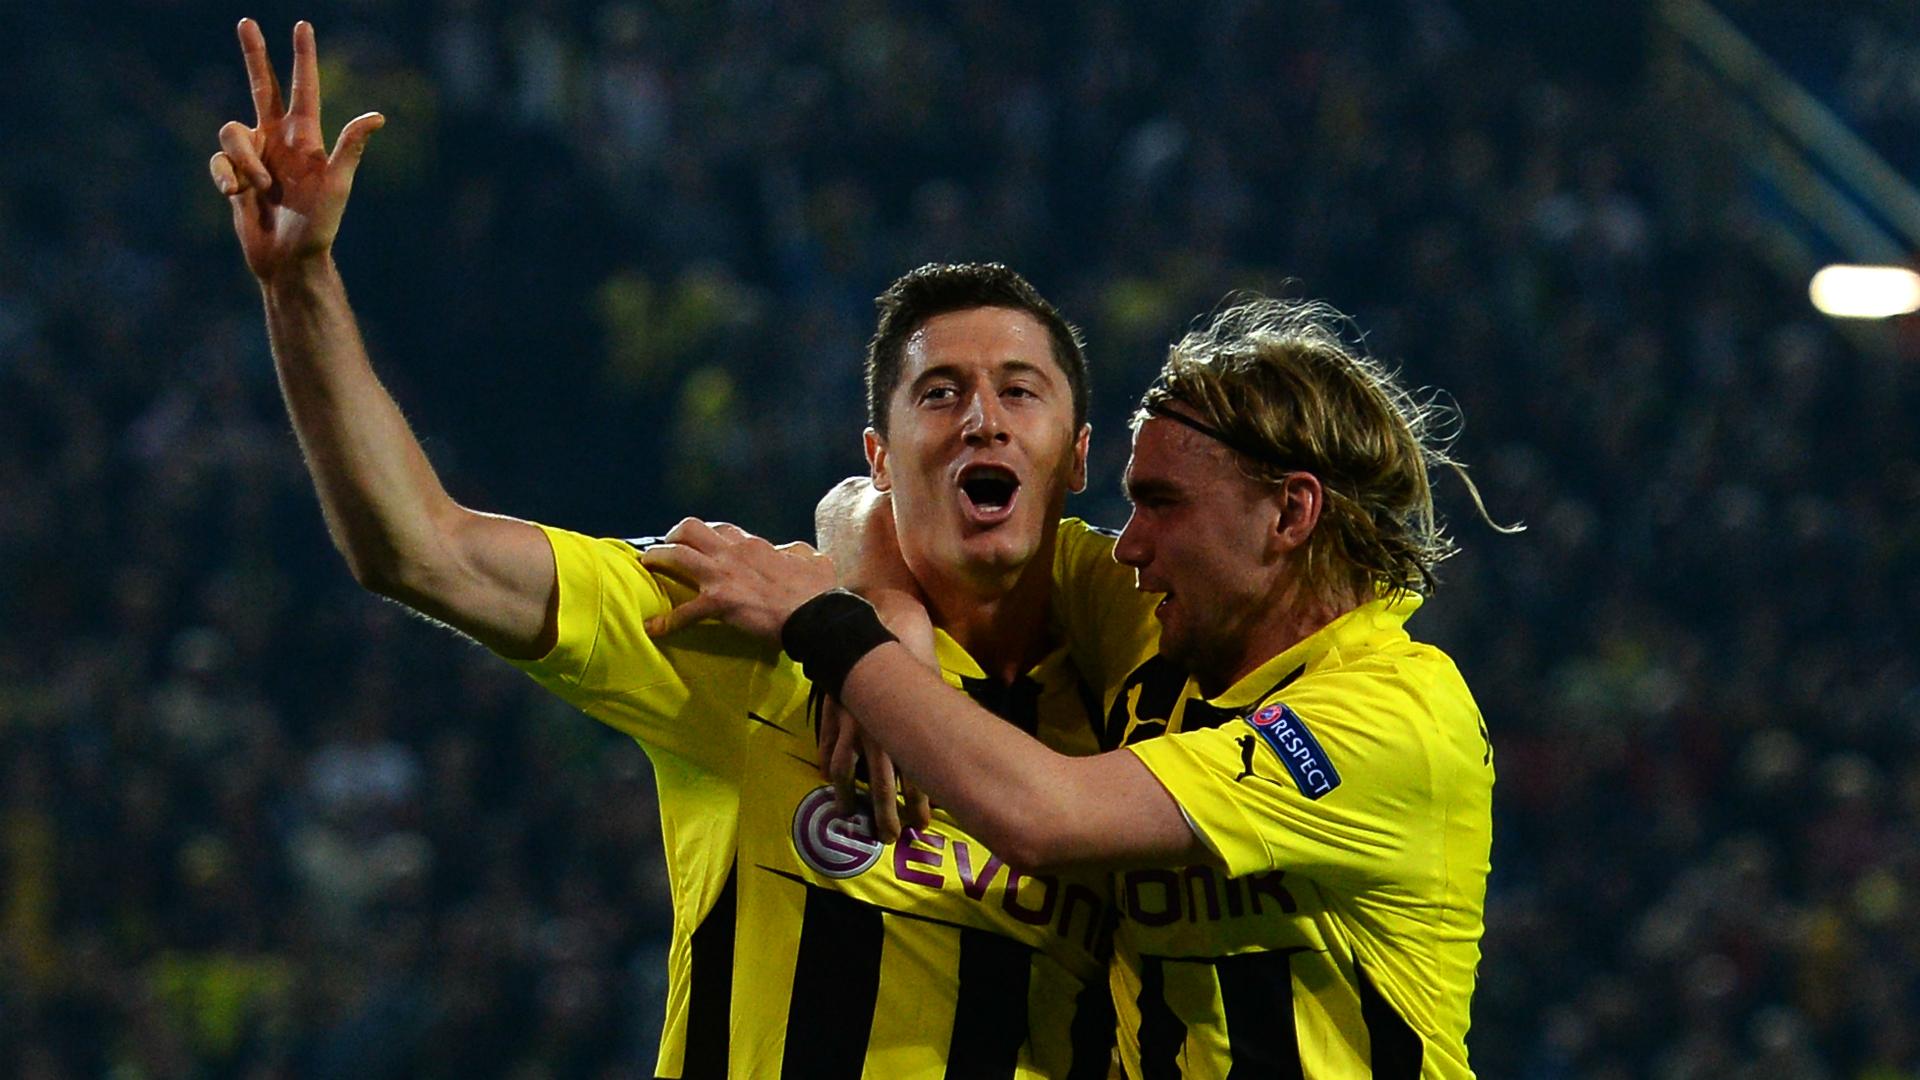 Lewandowski Schmelzer Borussia Dortmund - Real Madrid 04242013 Champions League